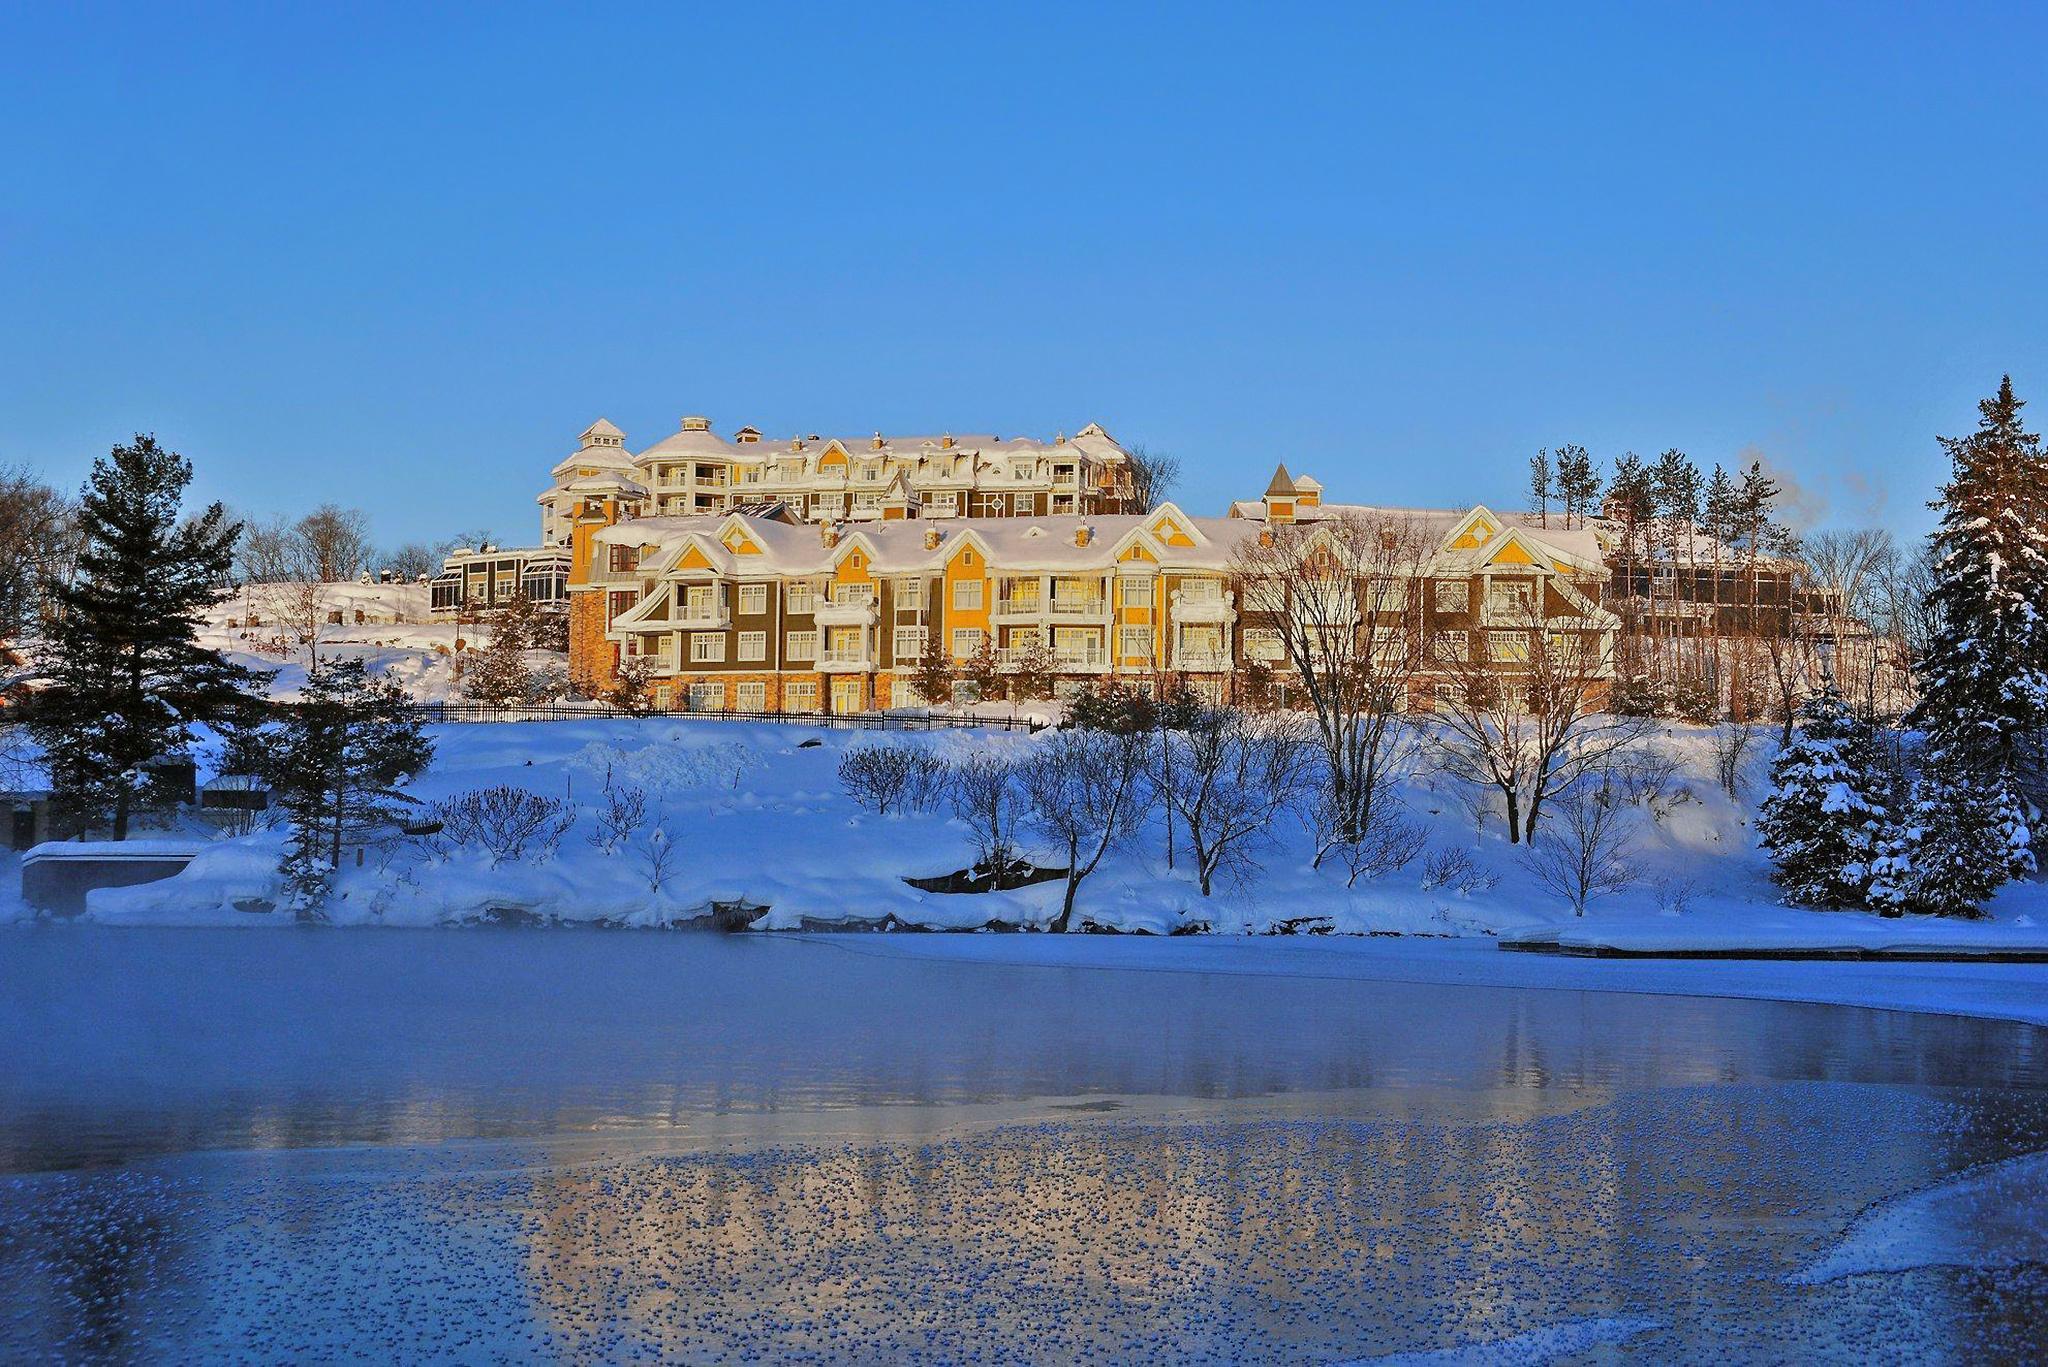 5 winter resorts for a weekend getaway near toronto